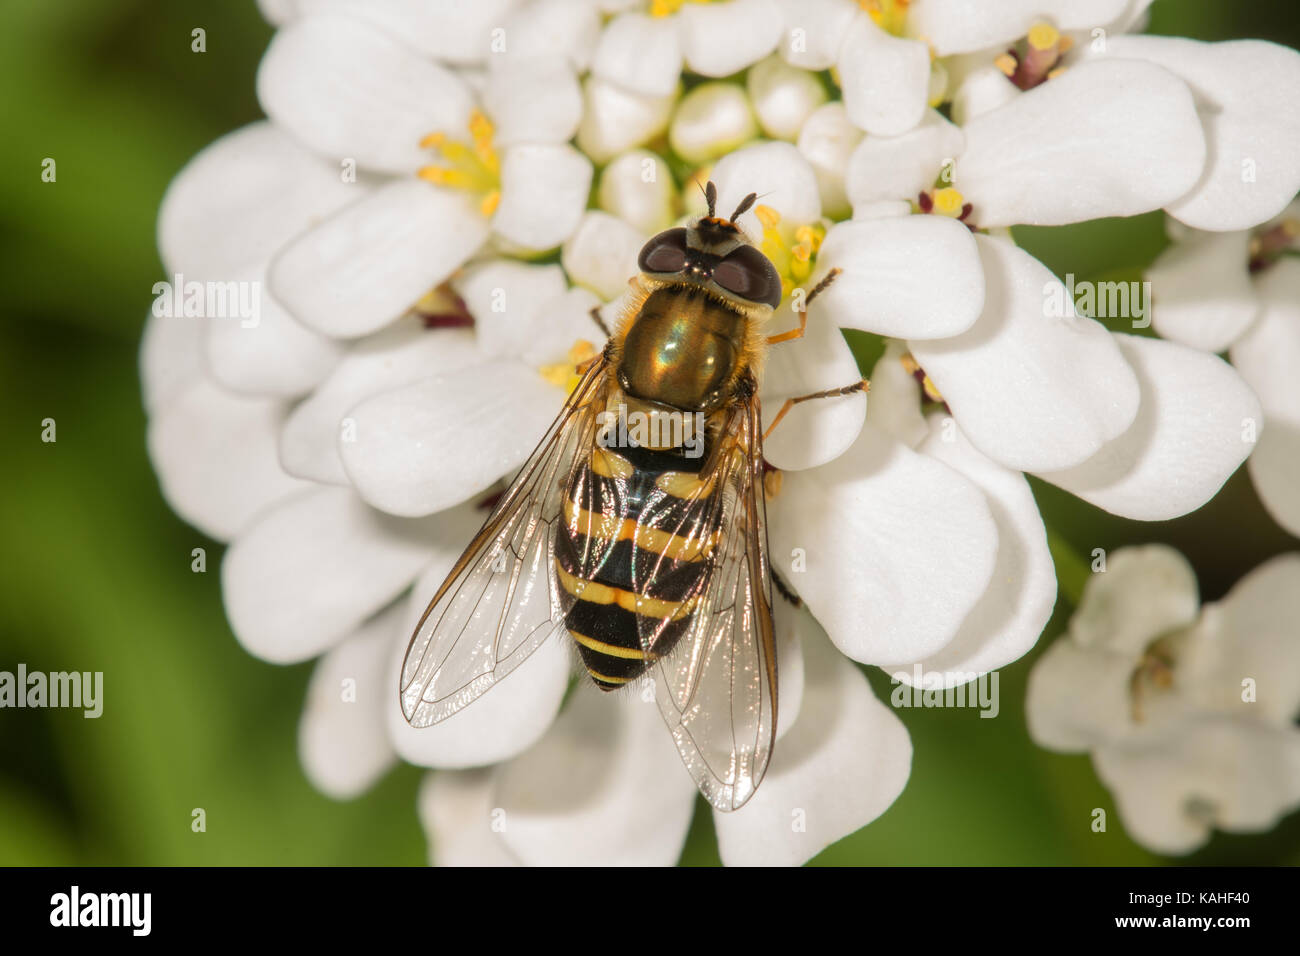 Hairy hover fly (Syrphus torvus), female on Evergreen candytuft (Iberis sempervirens), Baden-Württemberg, Germany - Stock Image